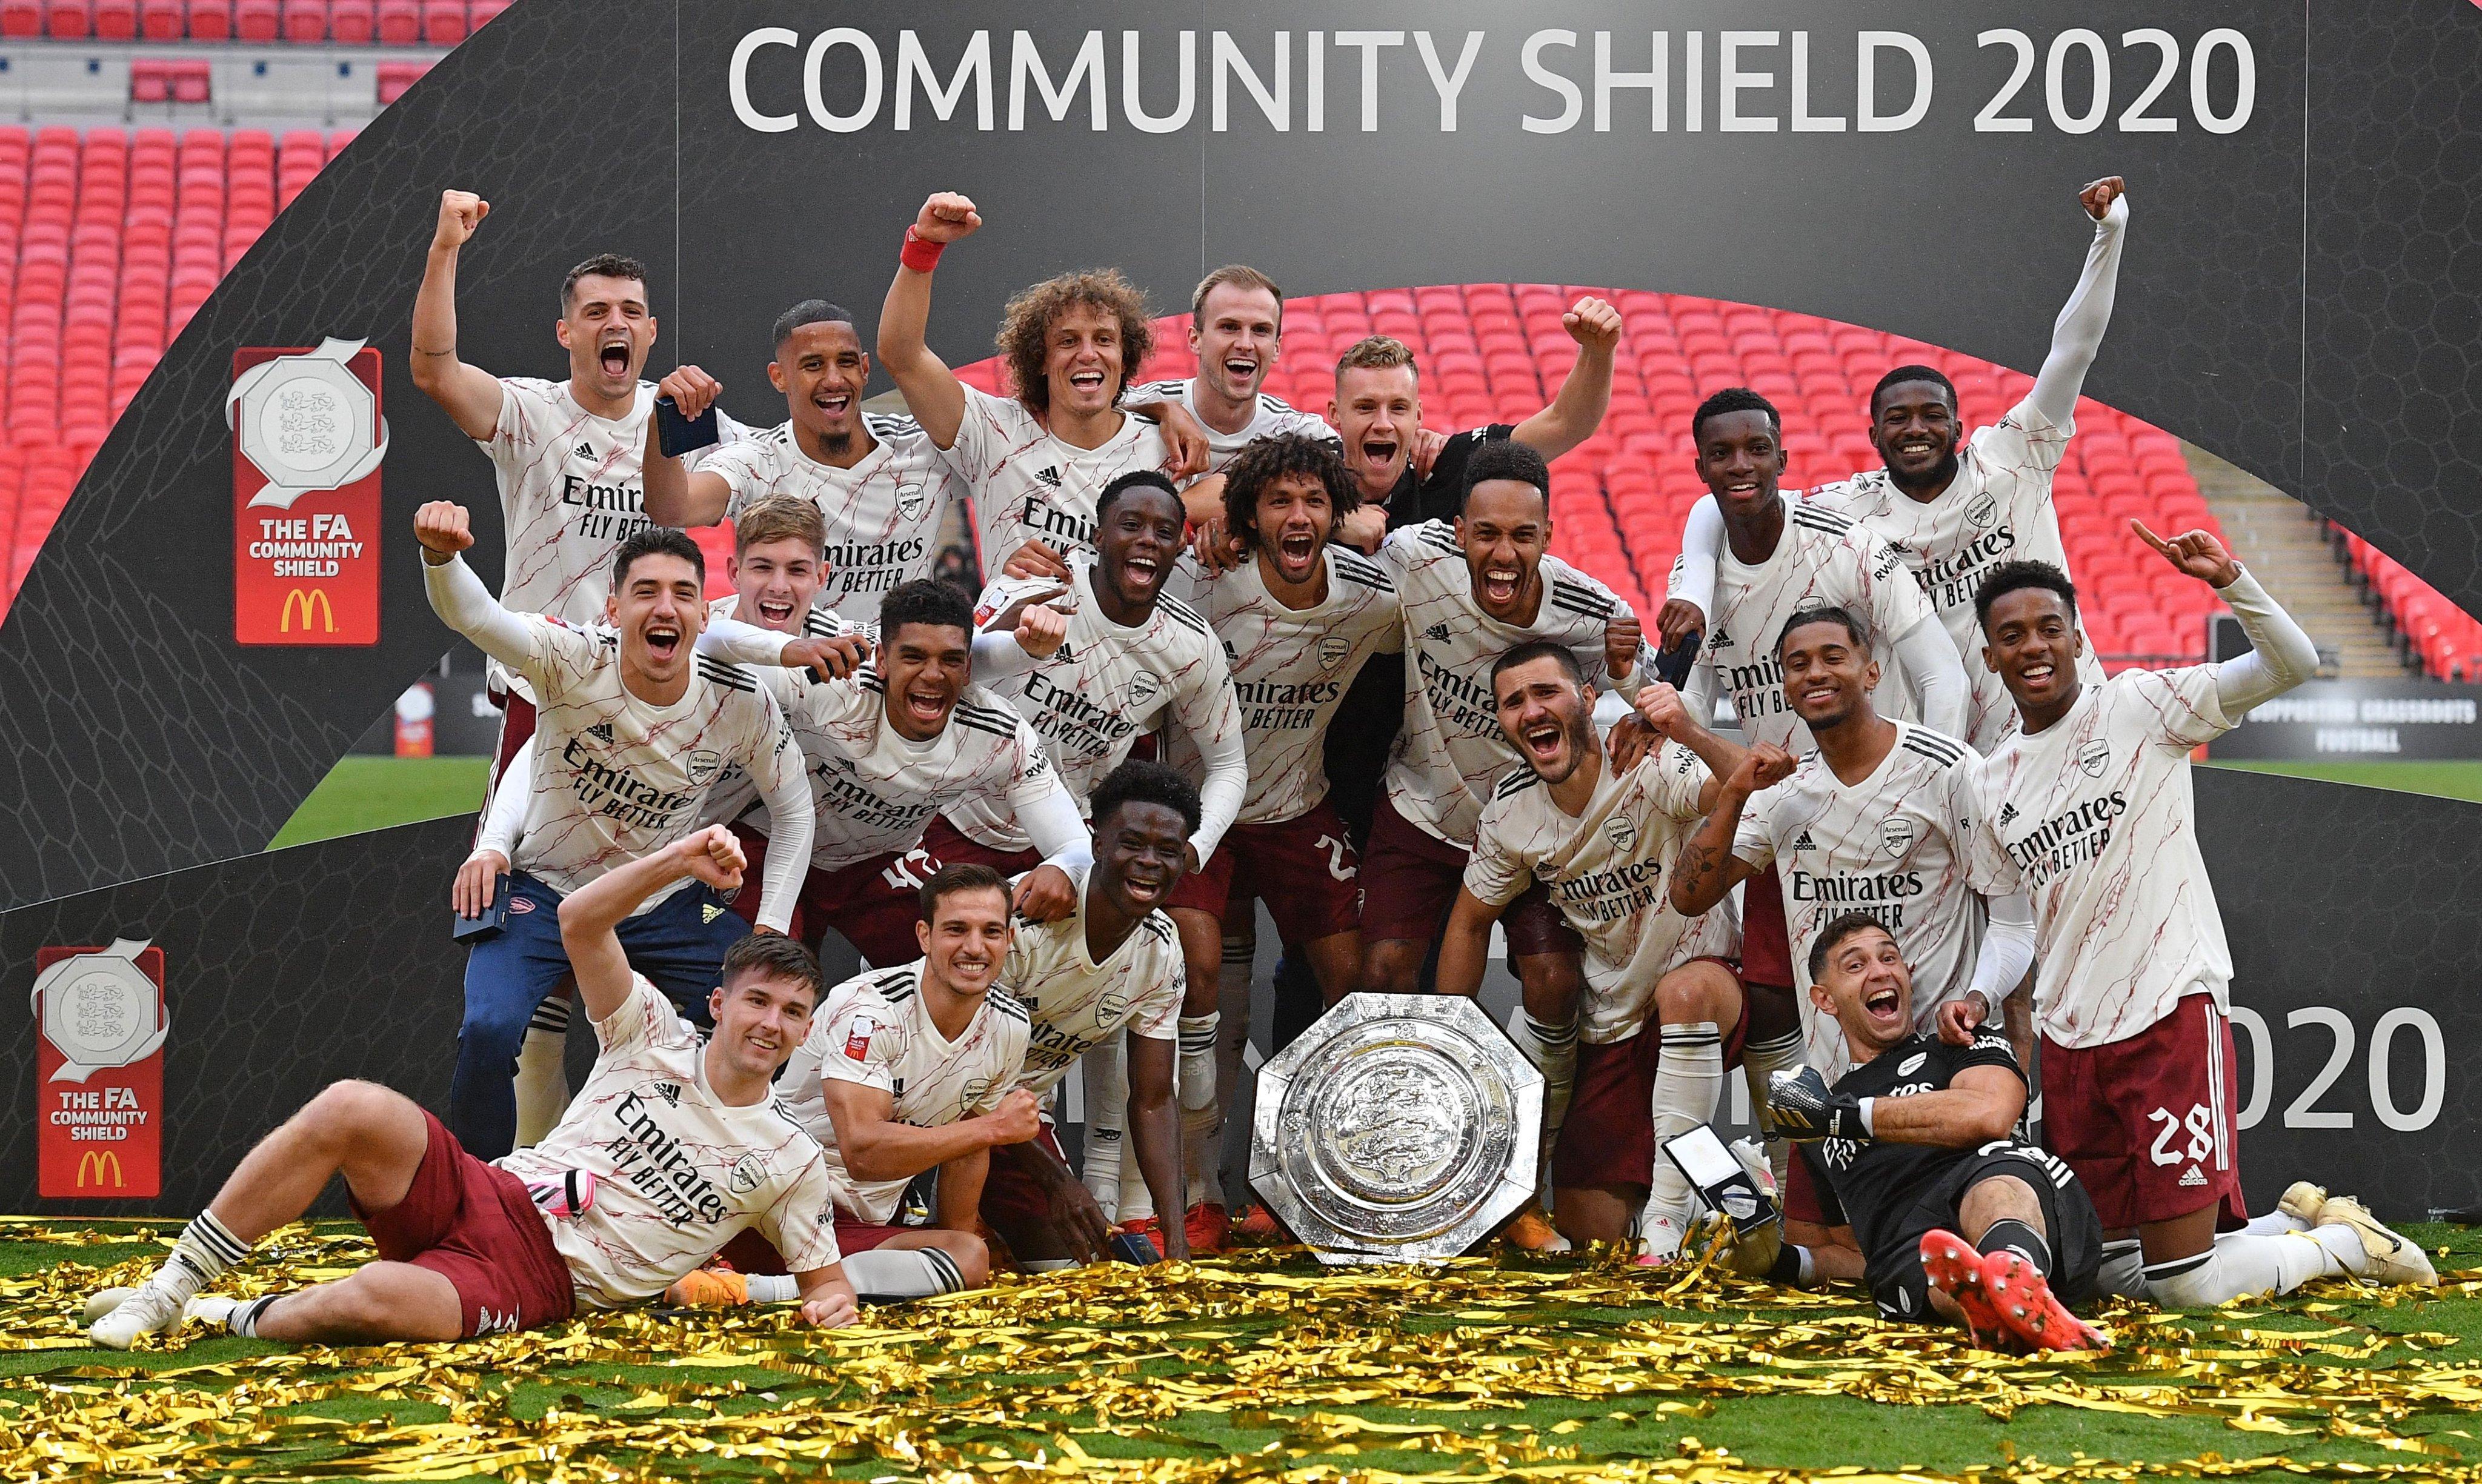 Arsenal _campeon_community_shield_2020_liverpool_balon_central